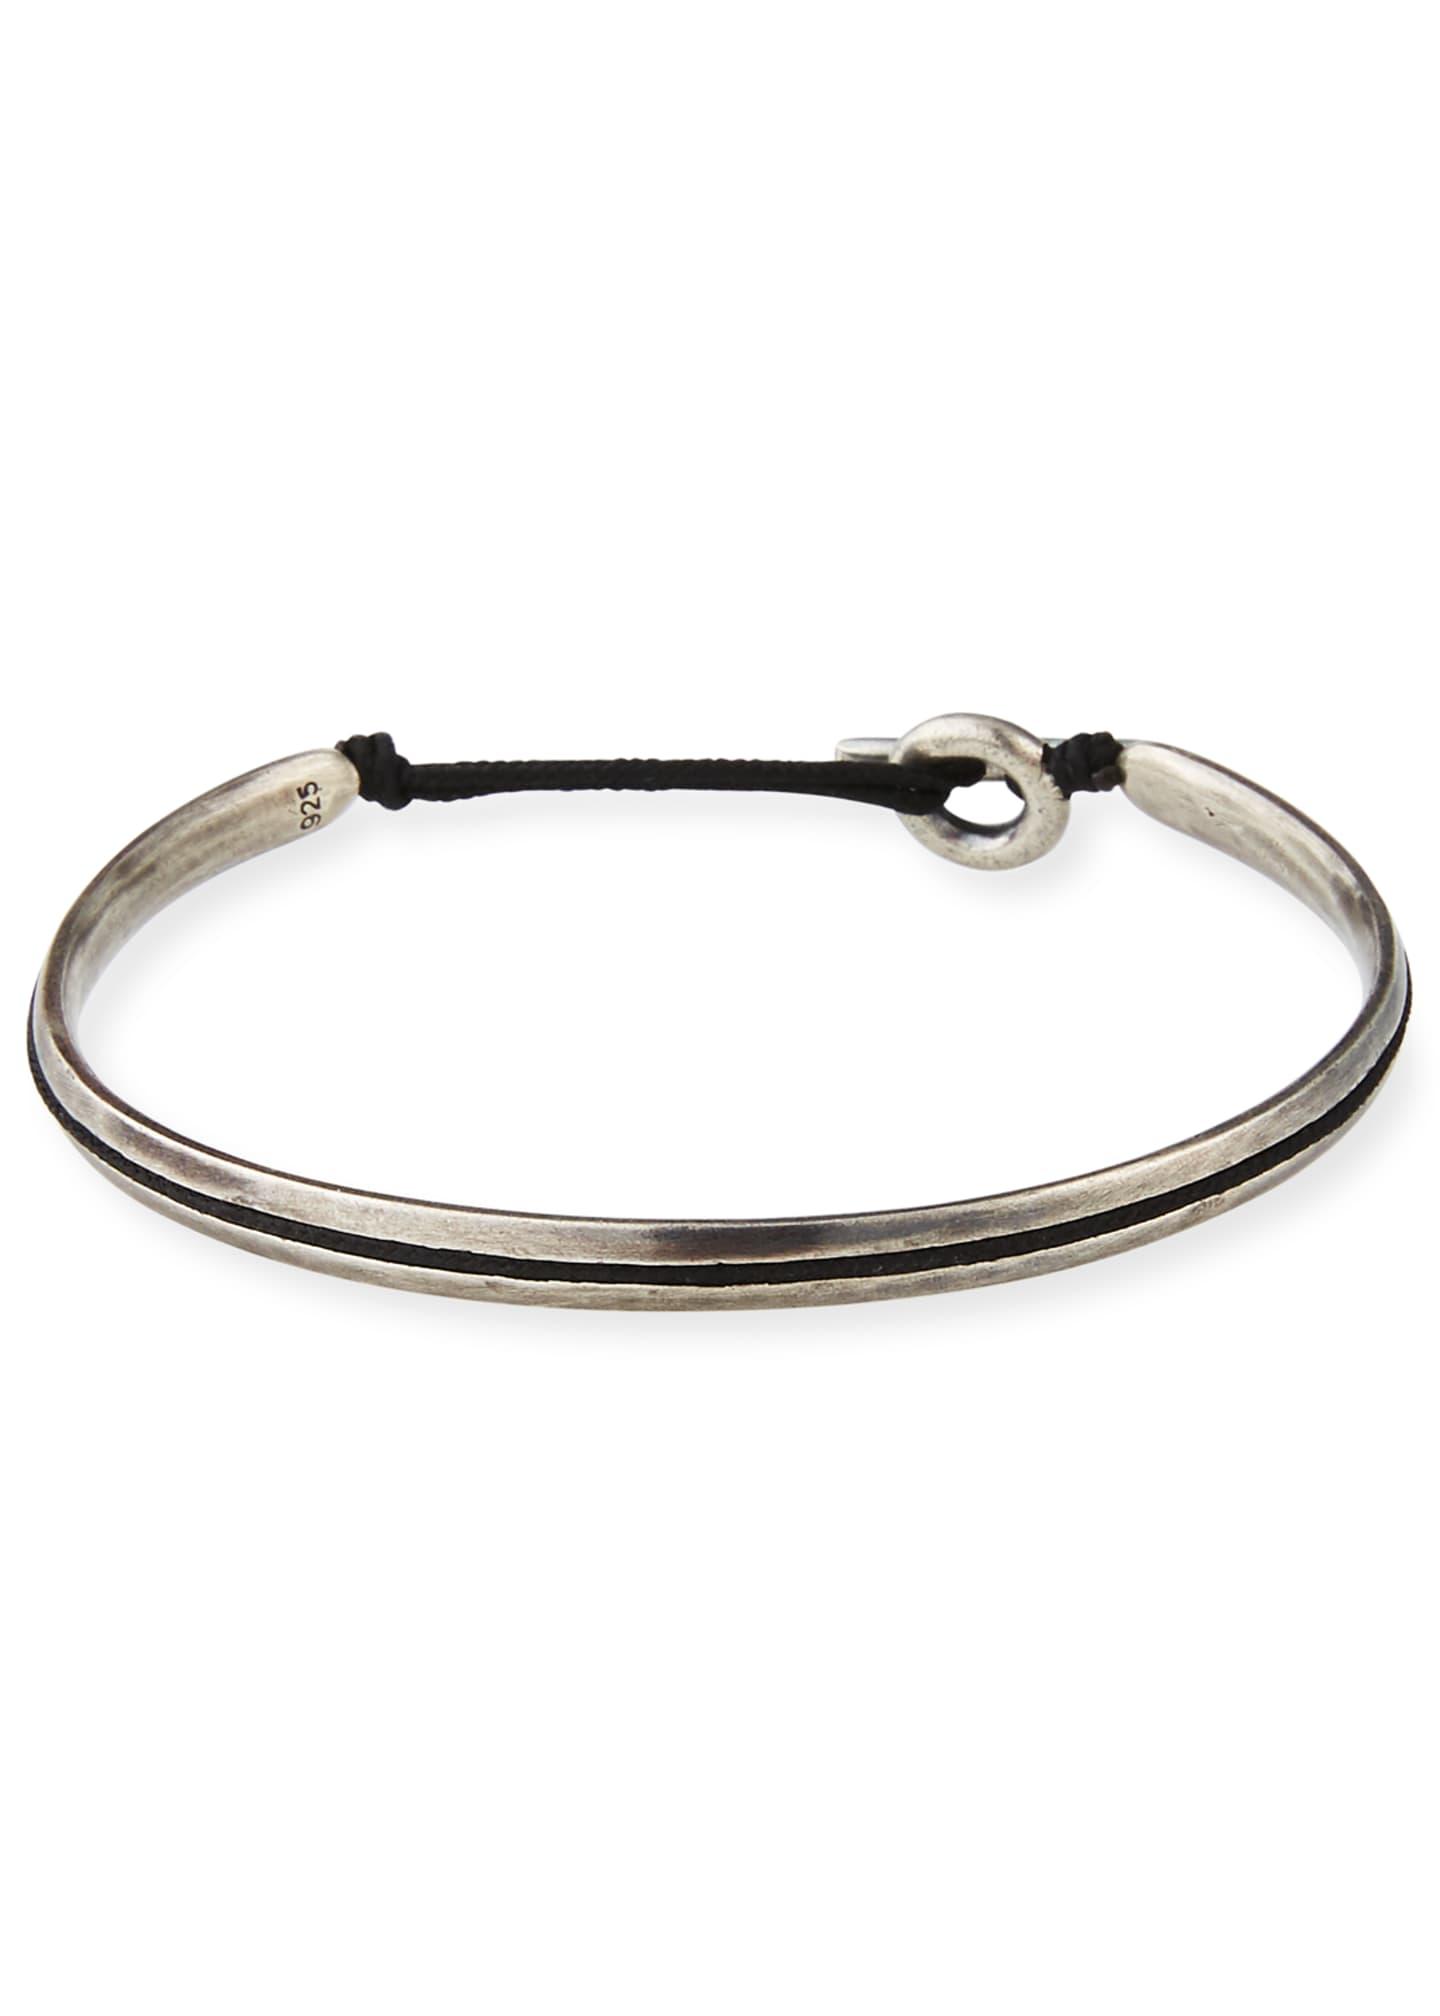 M. Cohen Men's Slim Oval Cuff Bracelet, Black